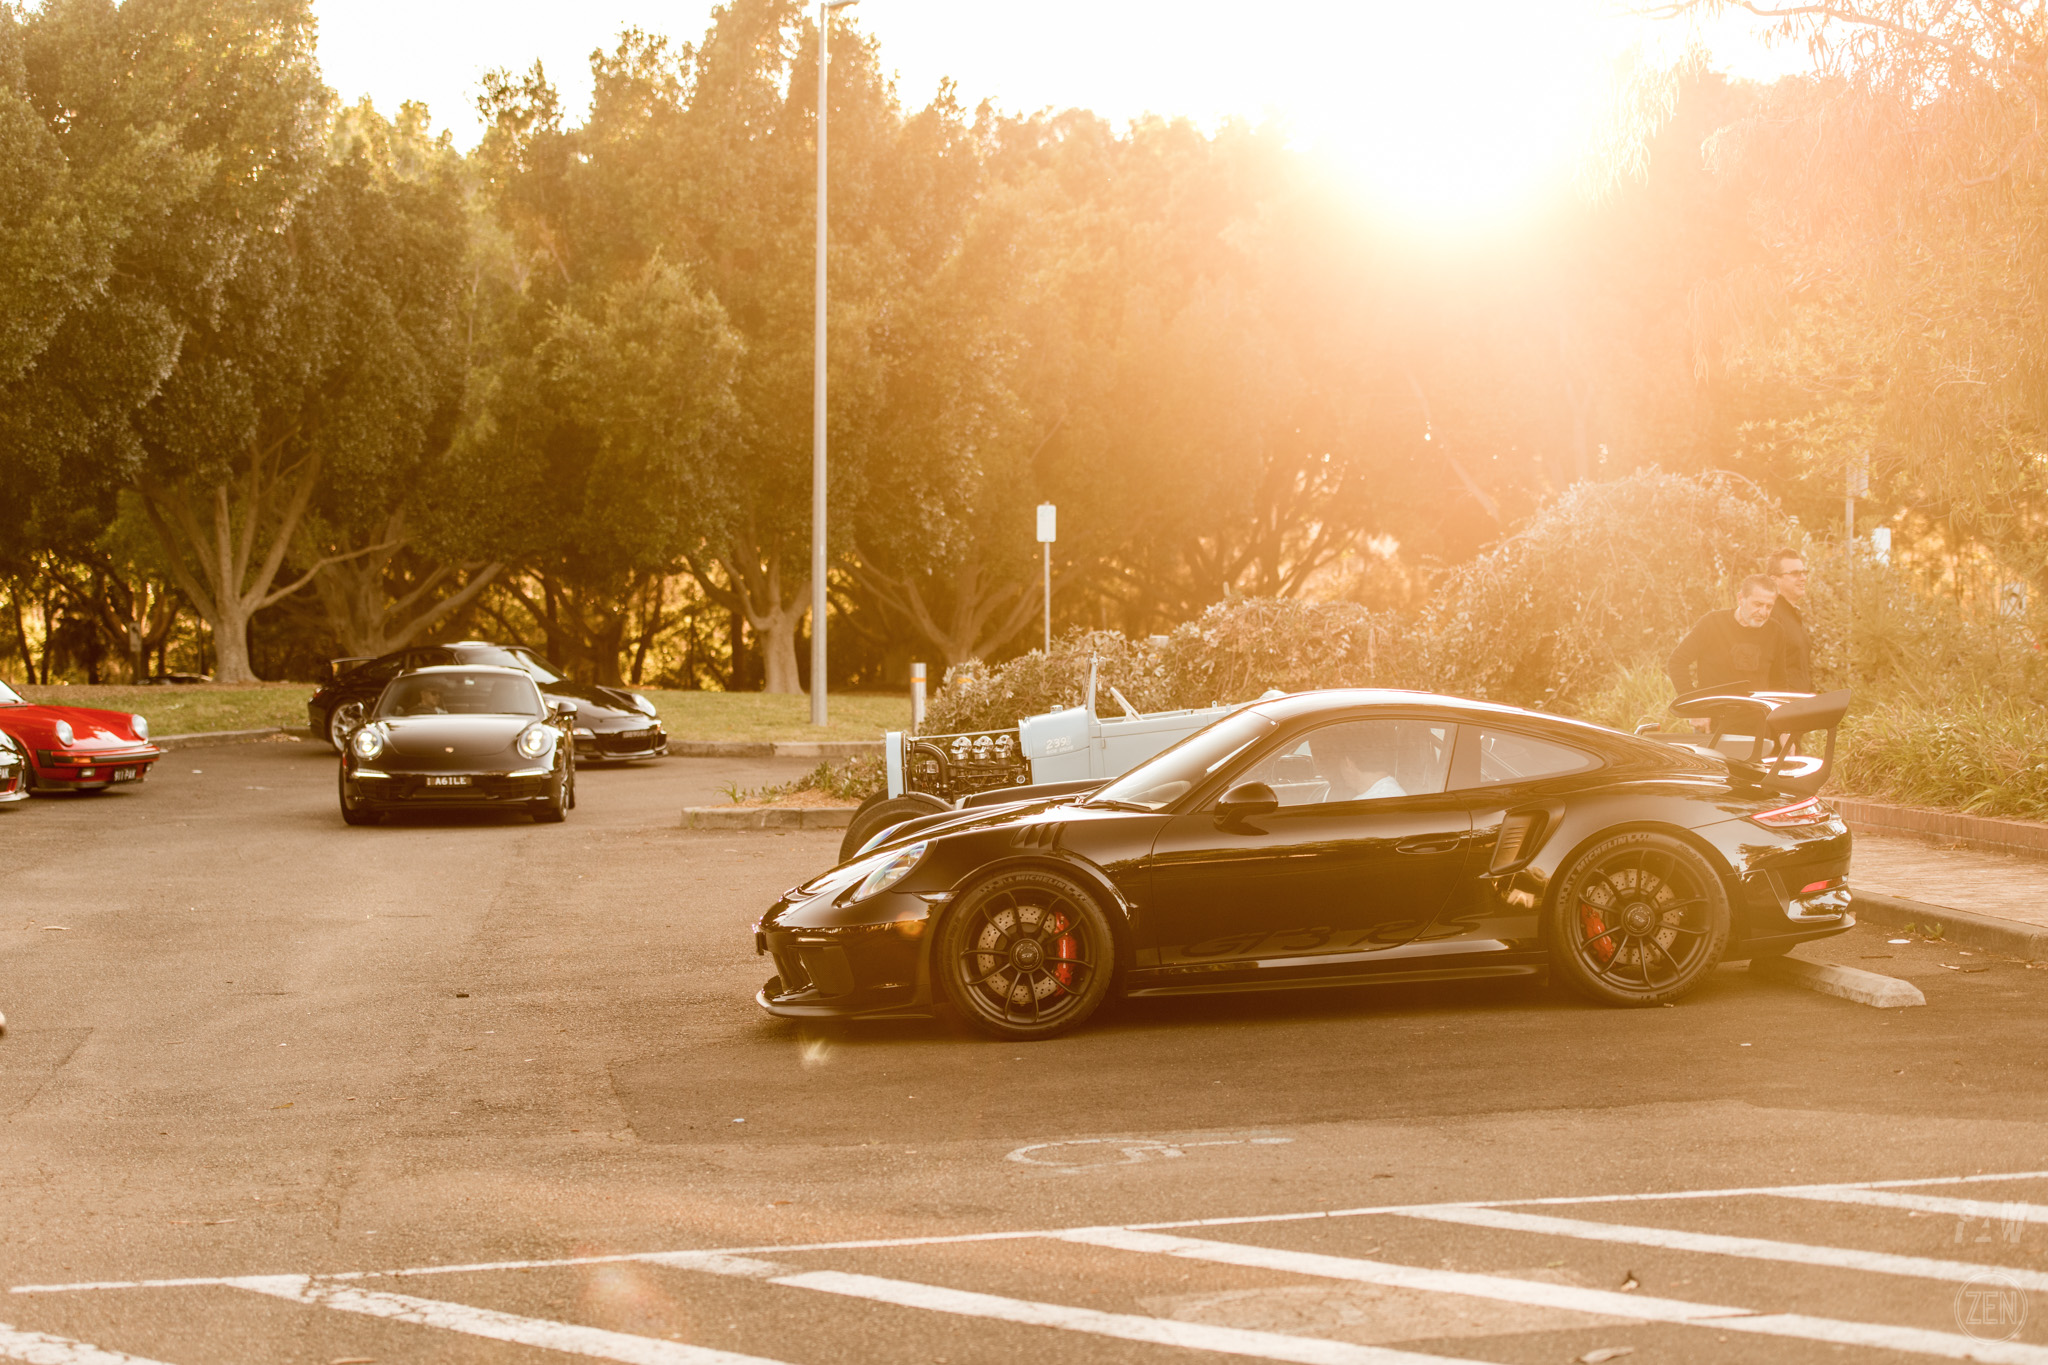 2019-10-27 - Autohaus Porsches & Coffee 025